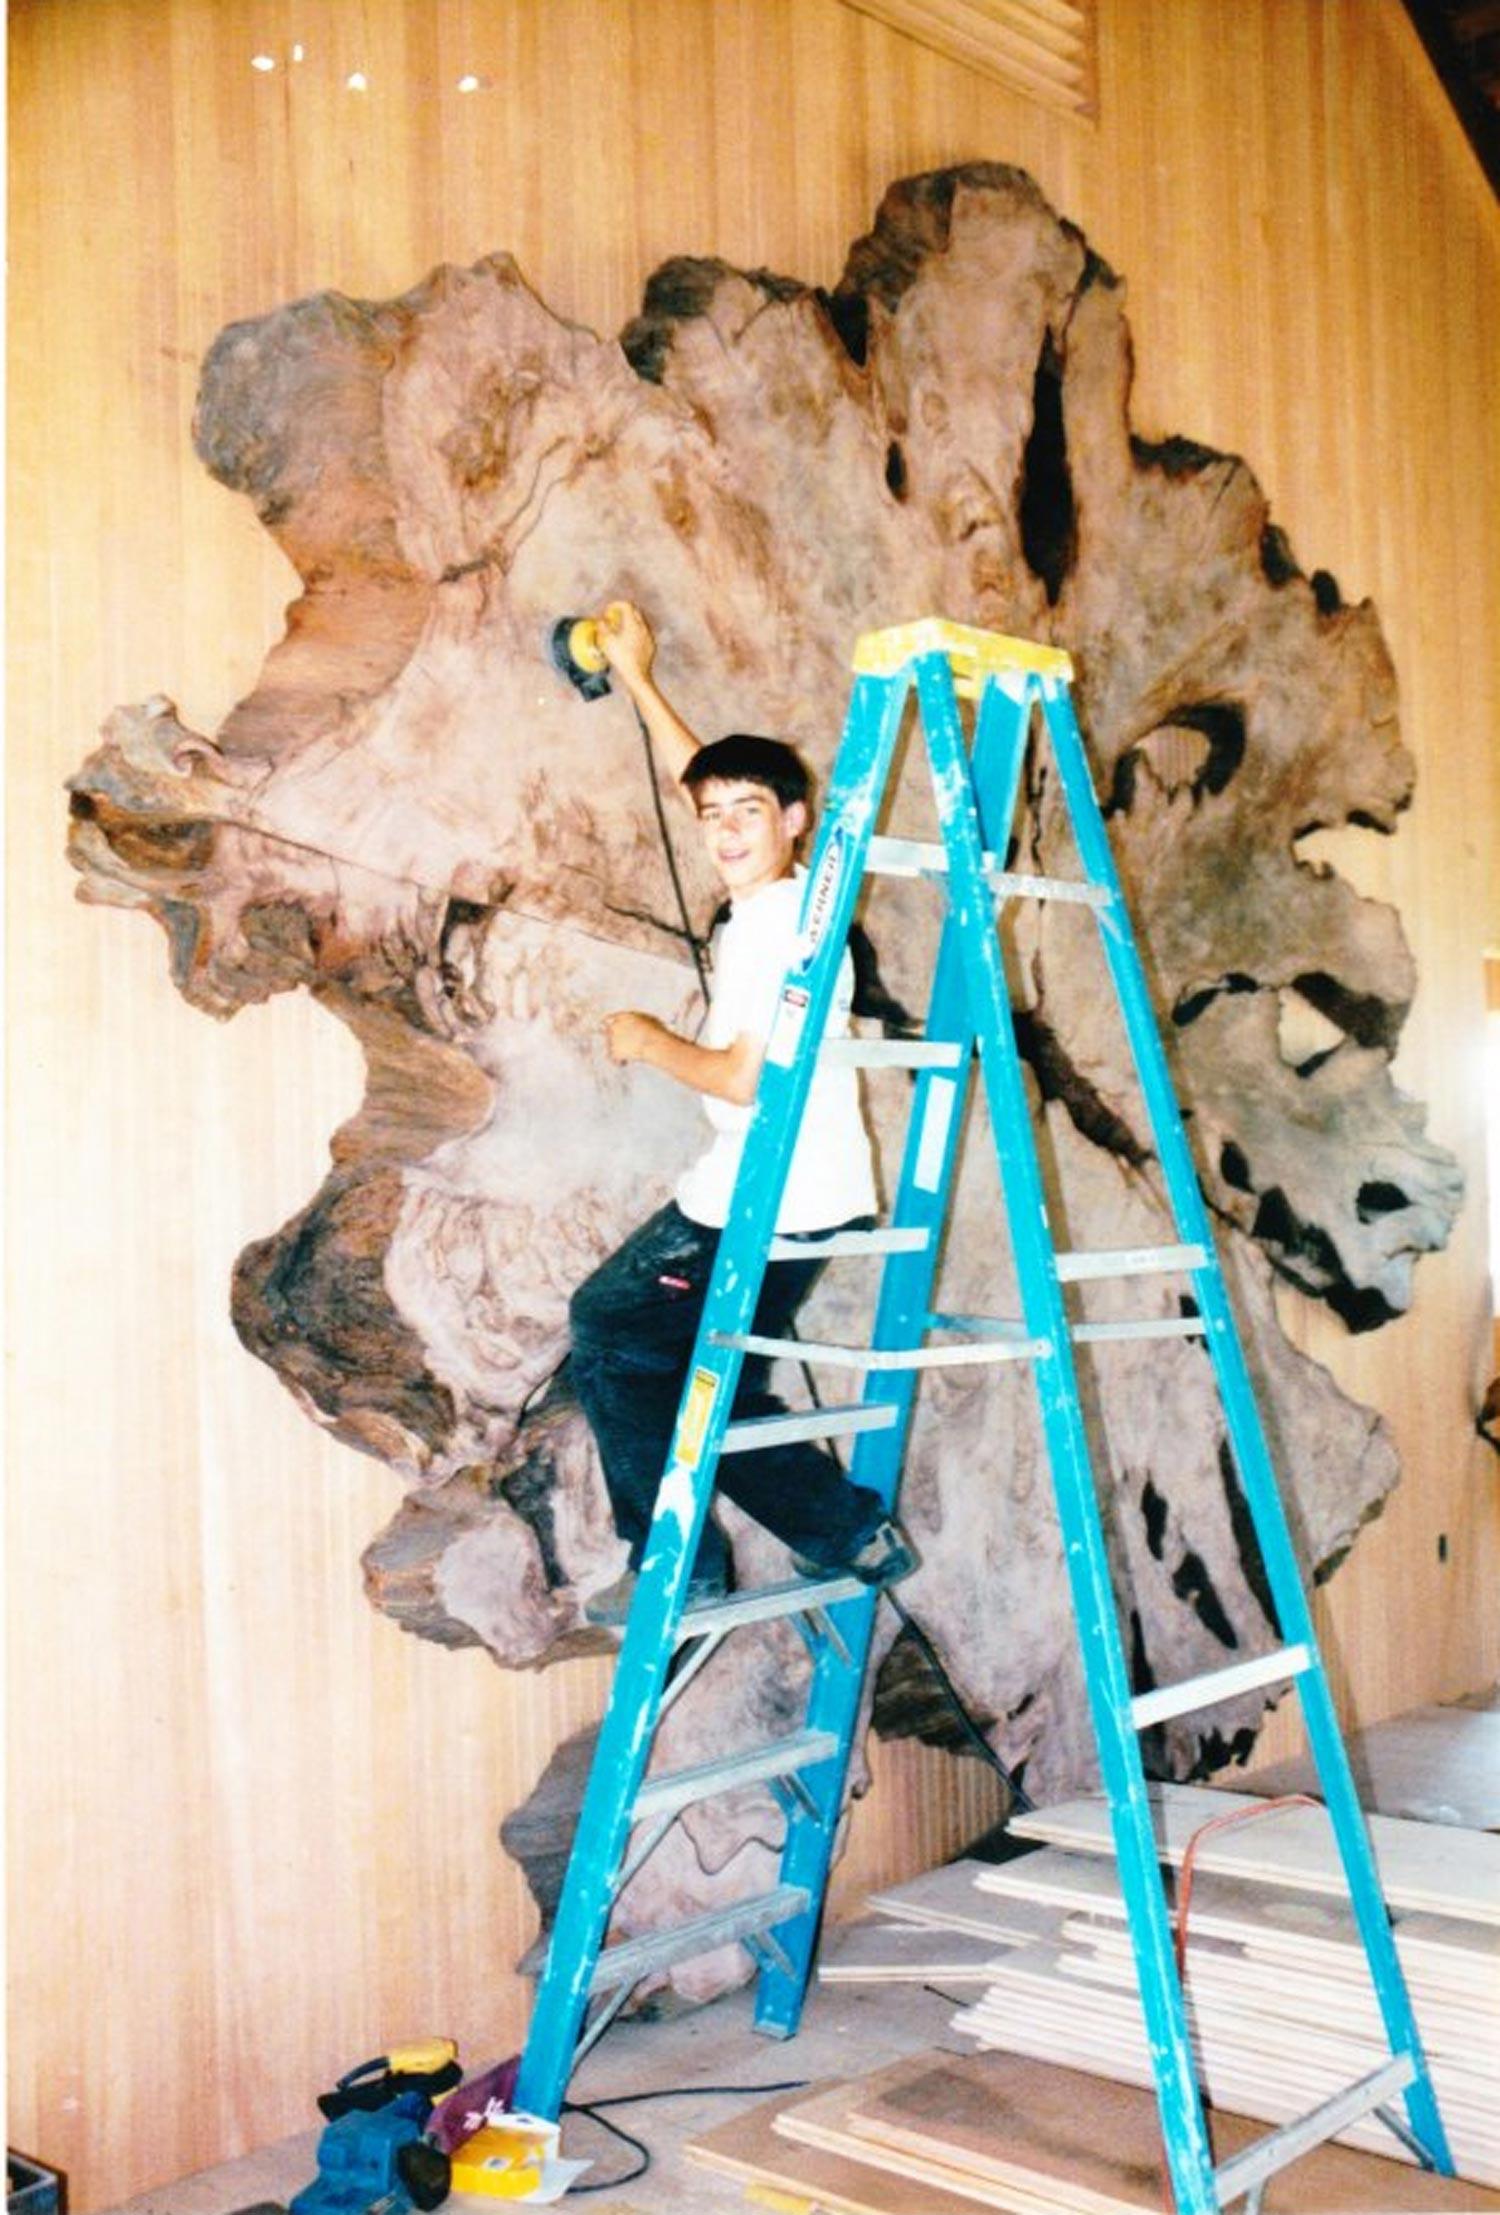 Ben Shope sanding redwood crosscut